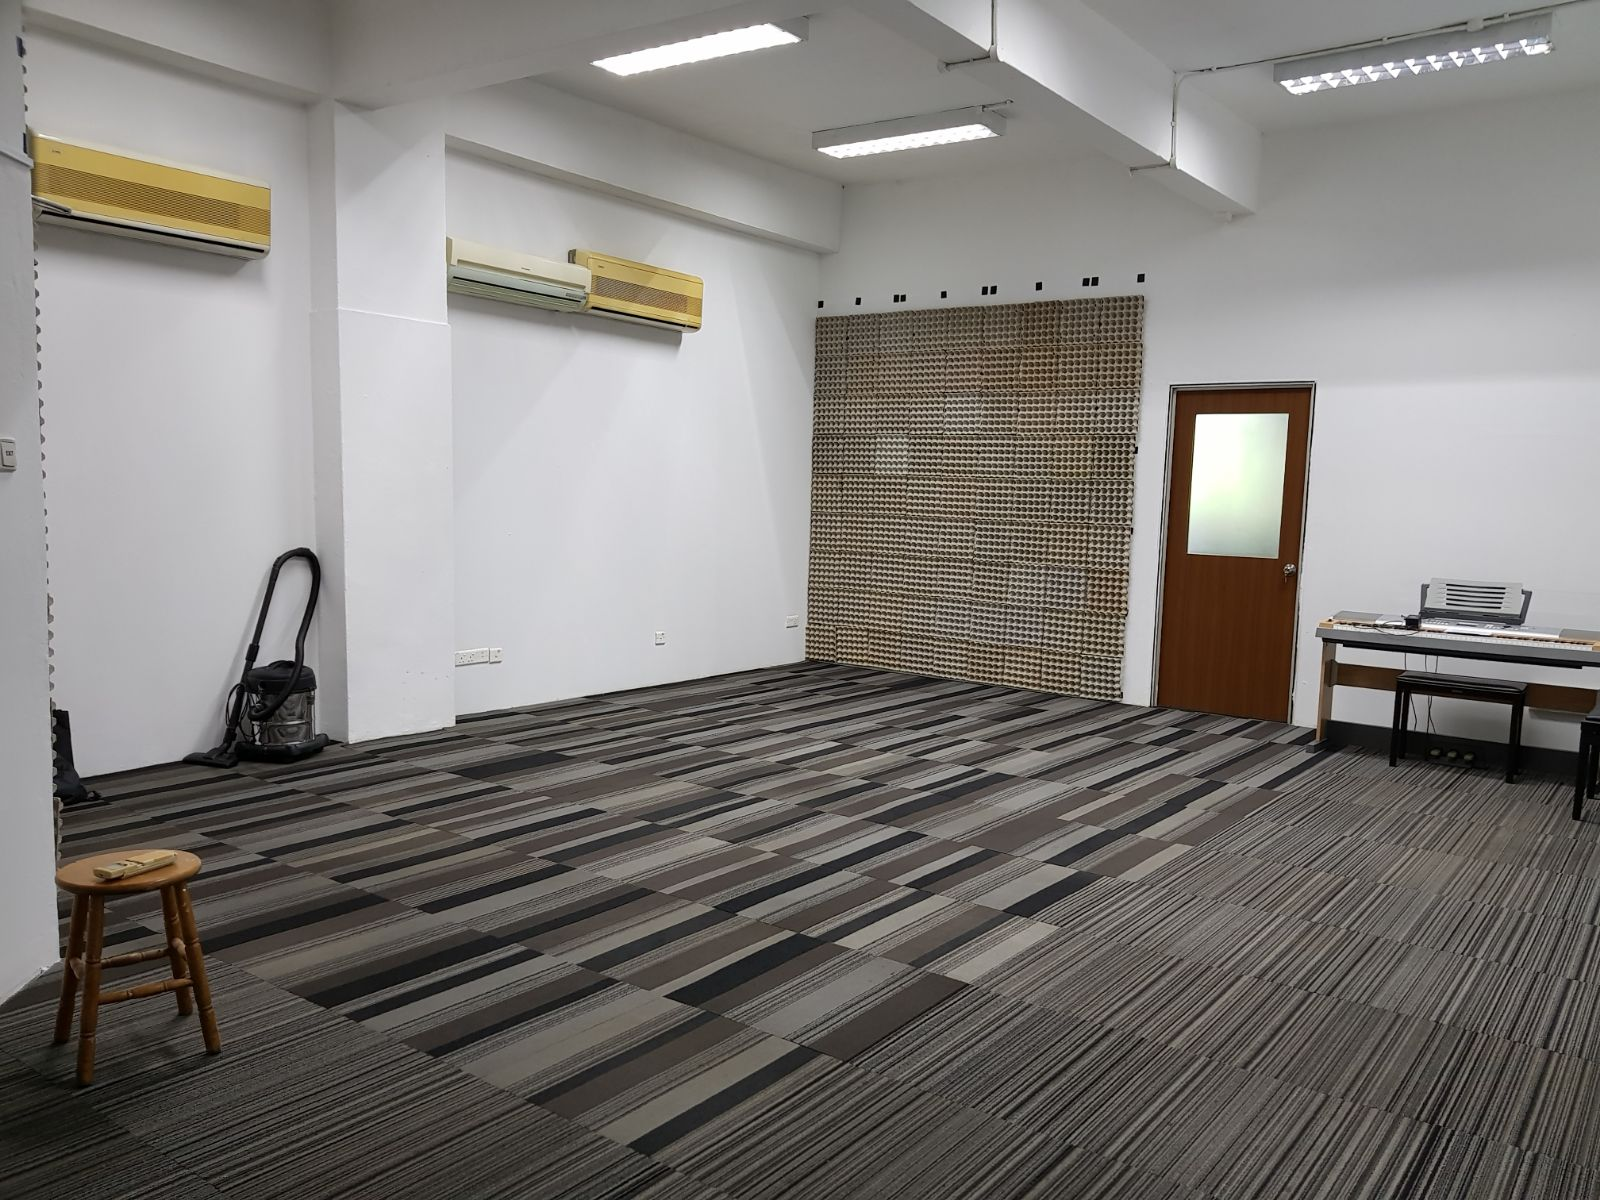 main room image 2